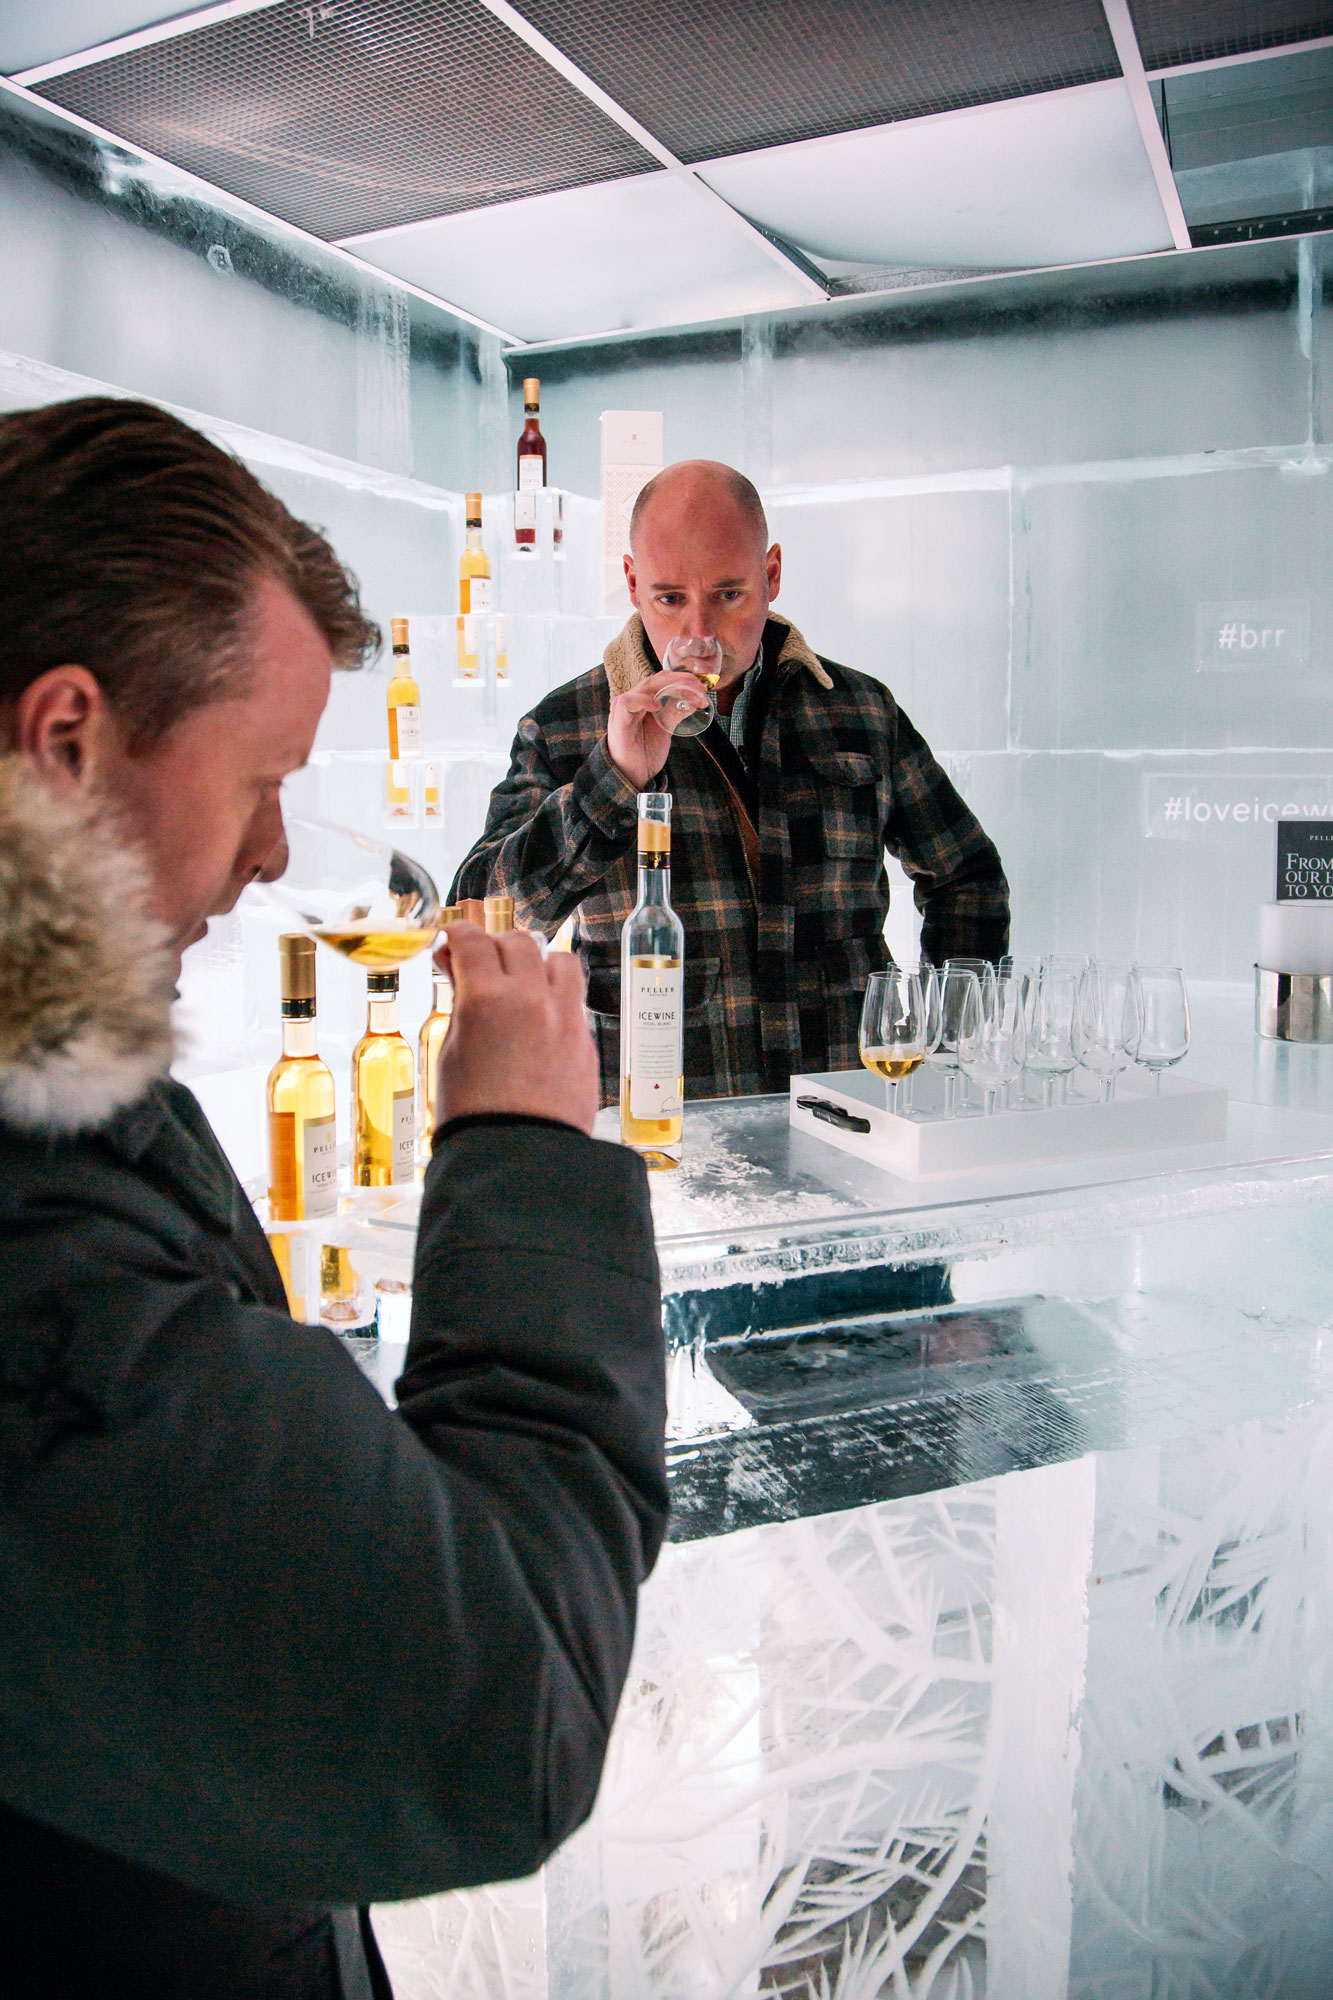 Degustation of Glenfiddich Winter Storm Whisky.